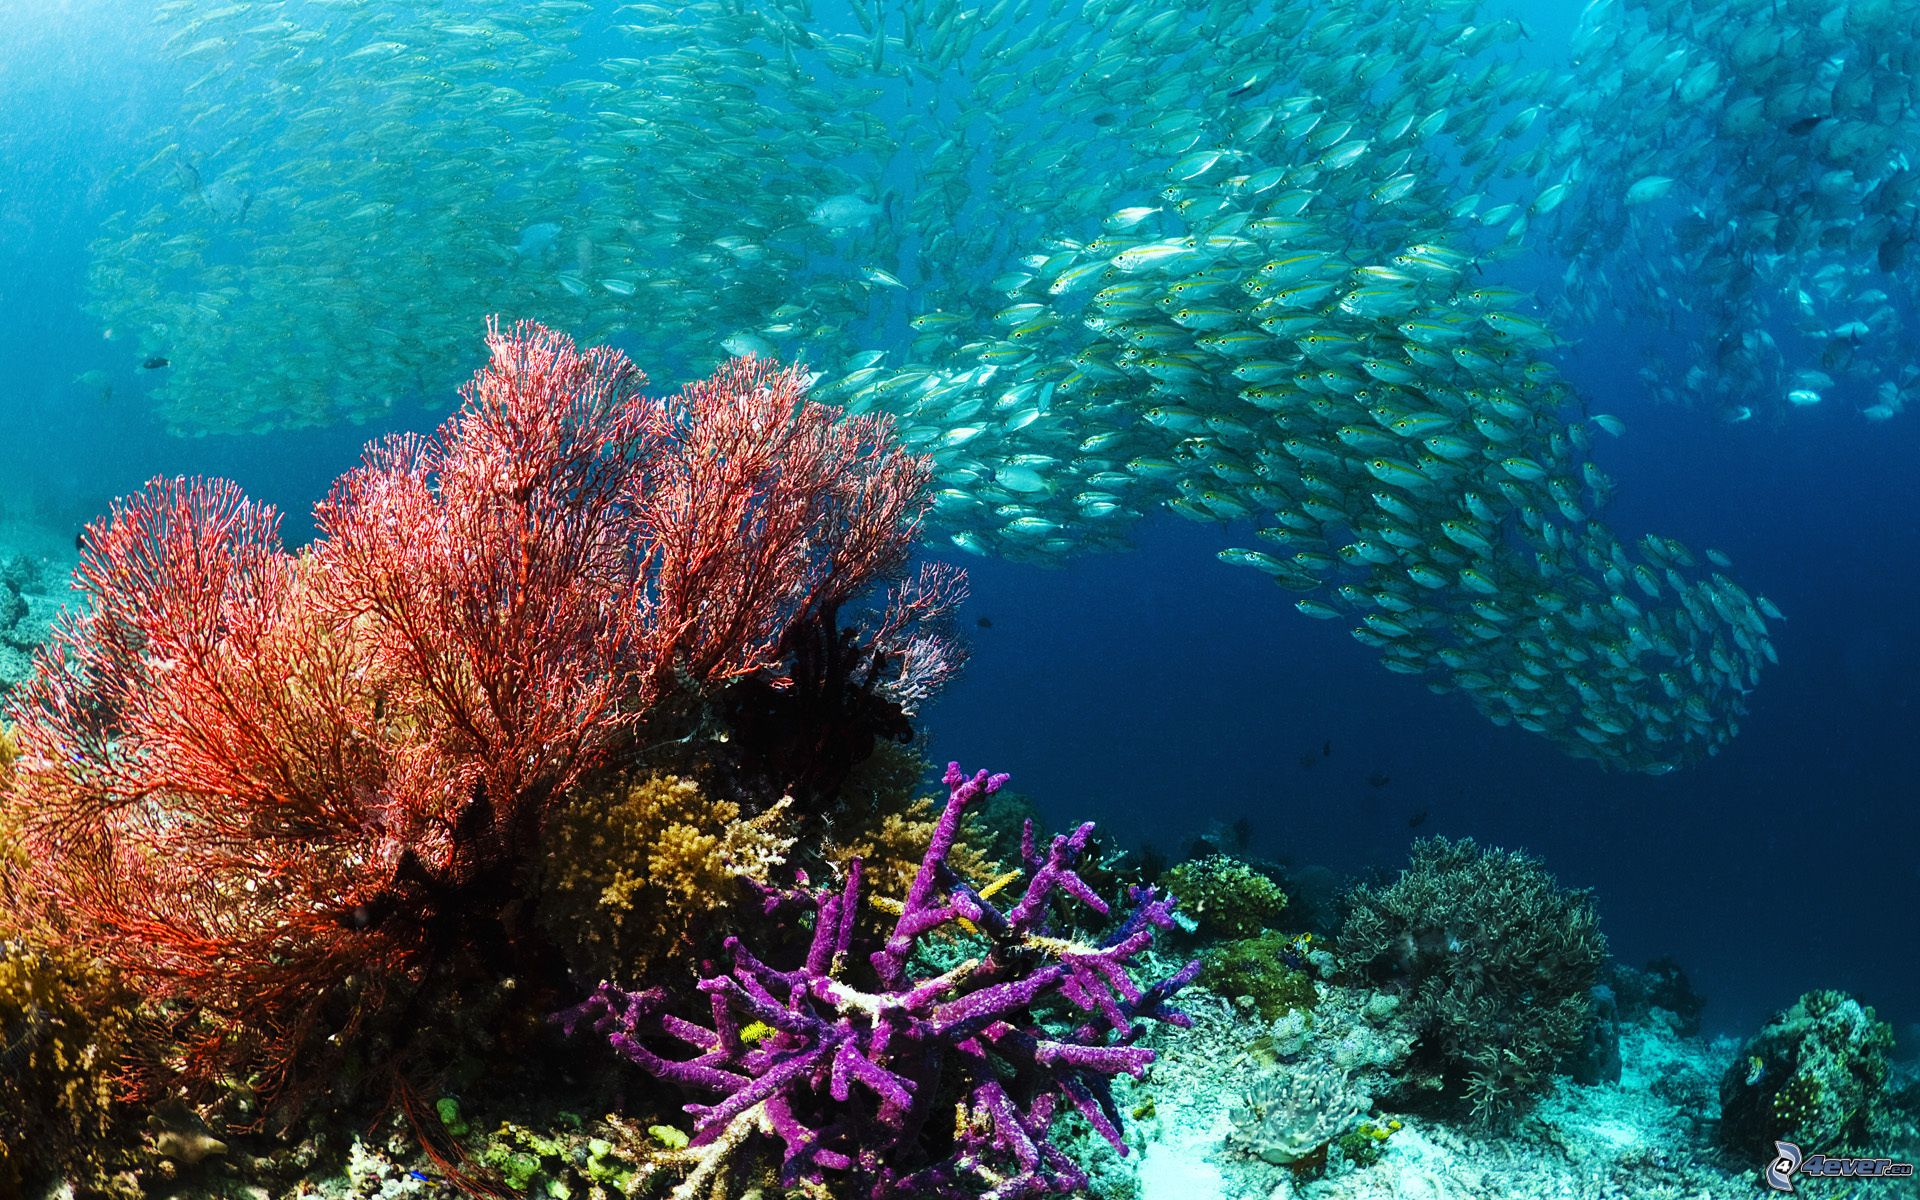 Fotografije morskih dubina - Page 10 Huf-ryb,-ryby,-morske-dno,-koraly-159622